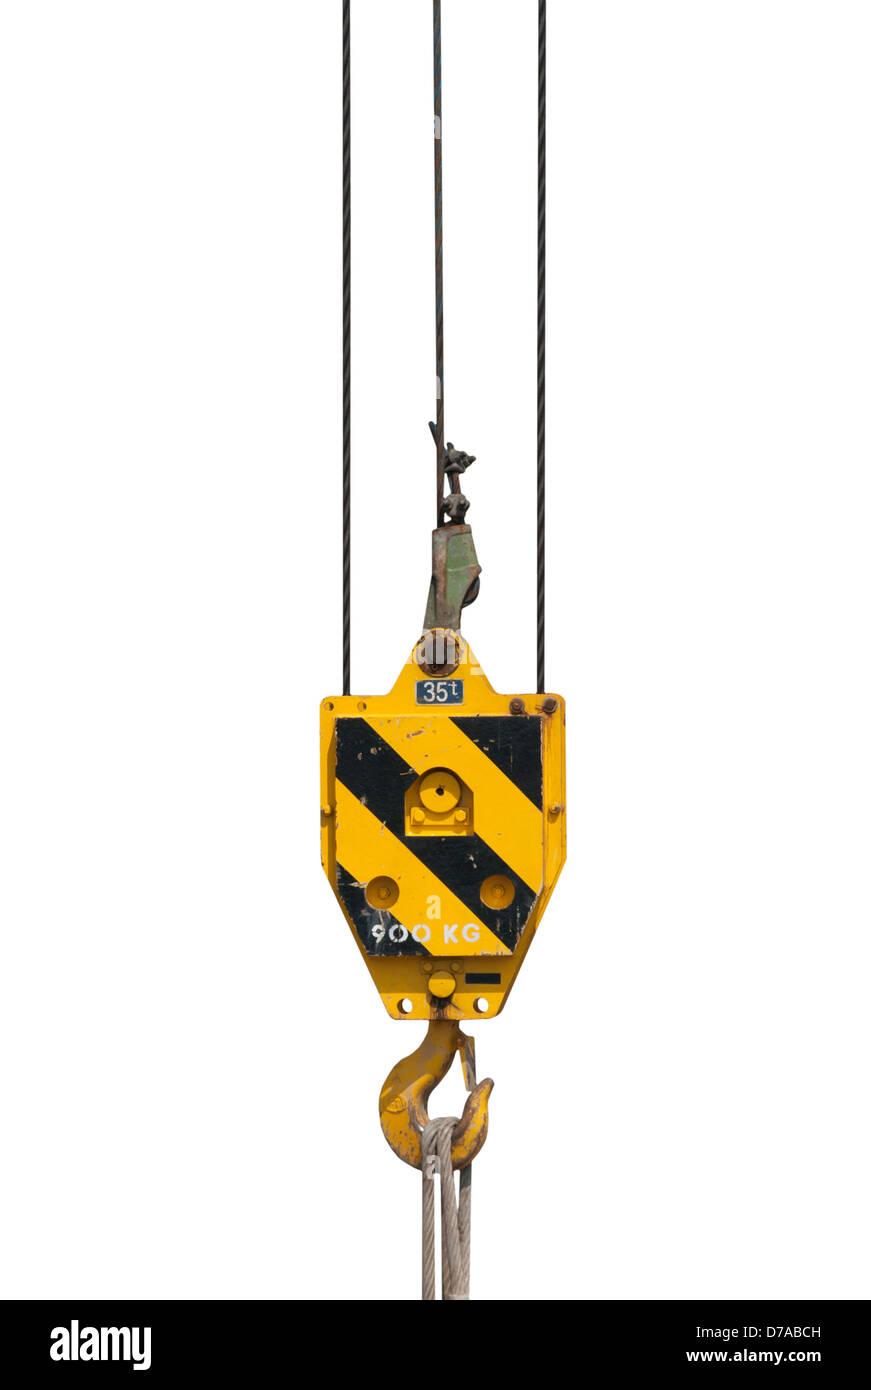 hight resolution of crane block and hook